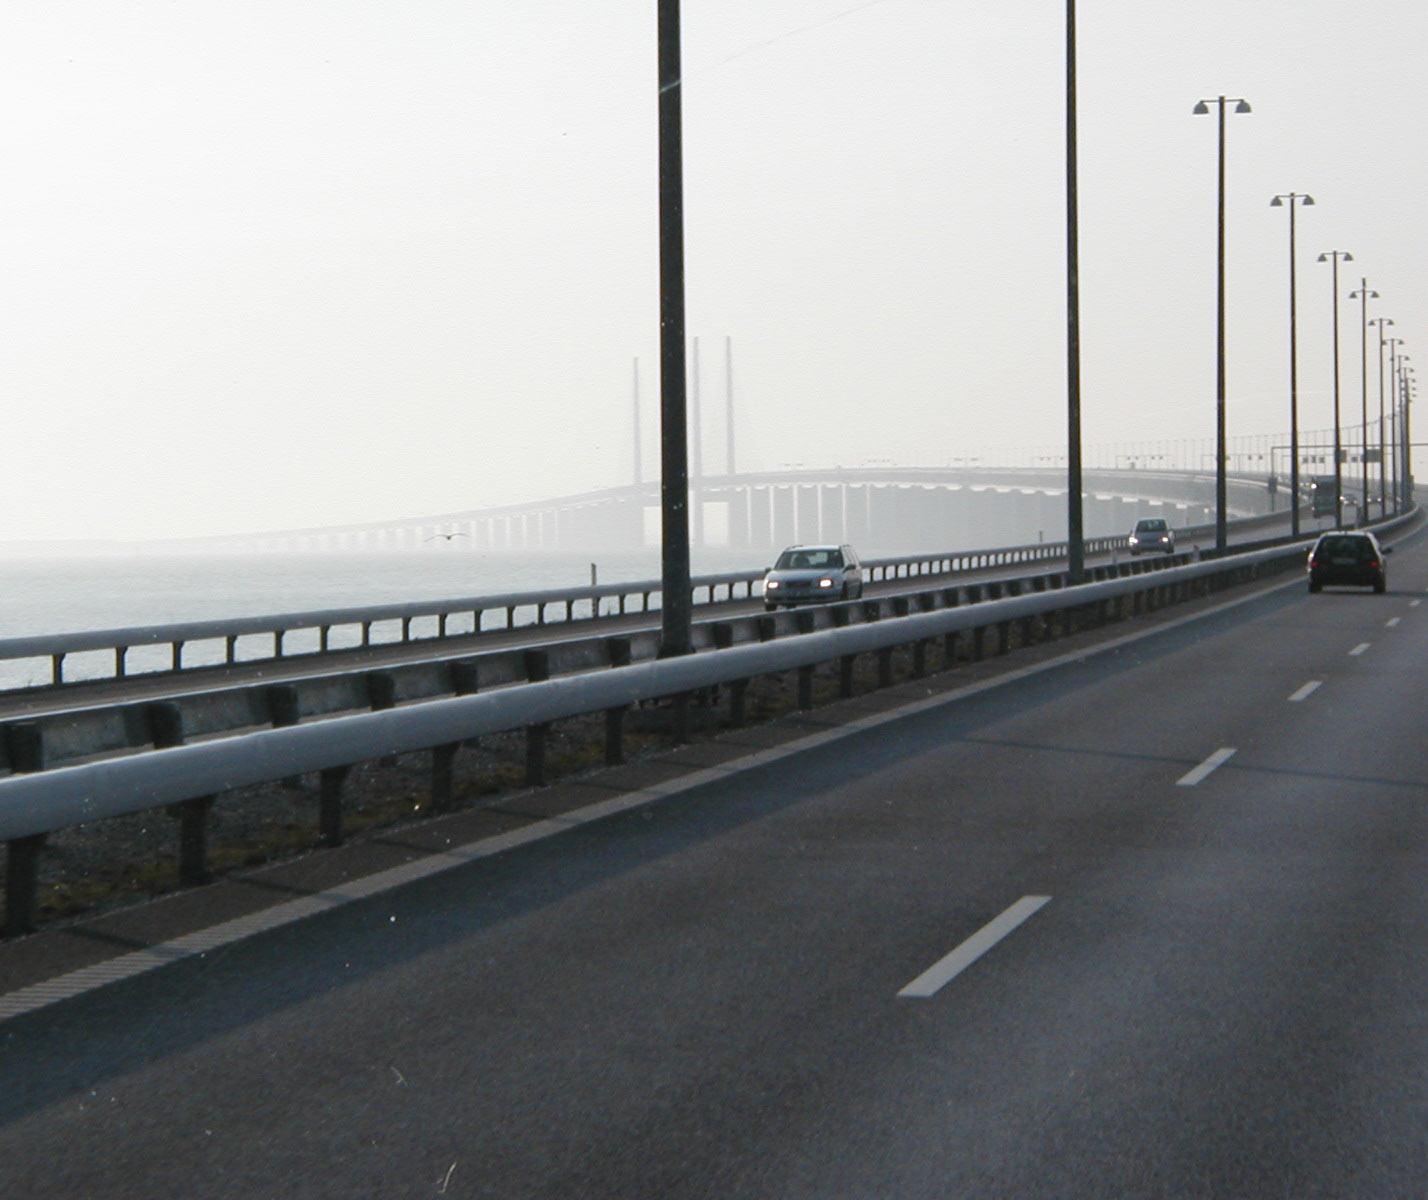 Bridge, Car, Construction, Foggy, HQ Photo